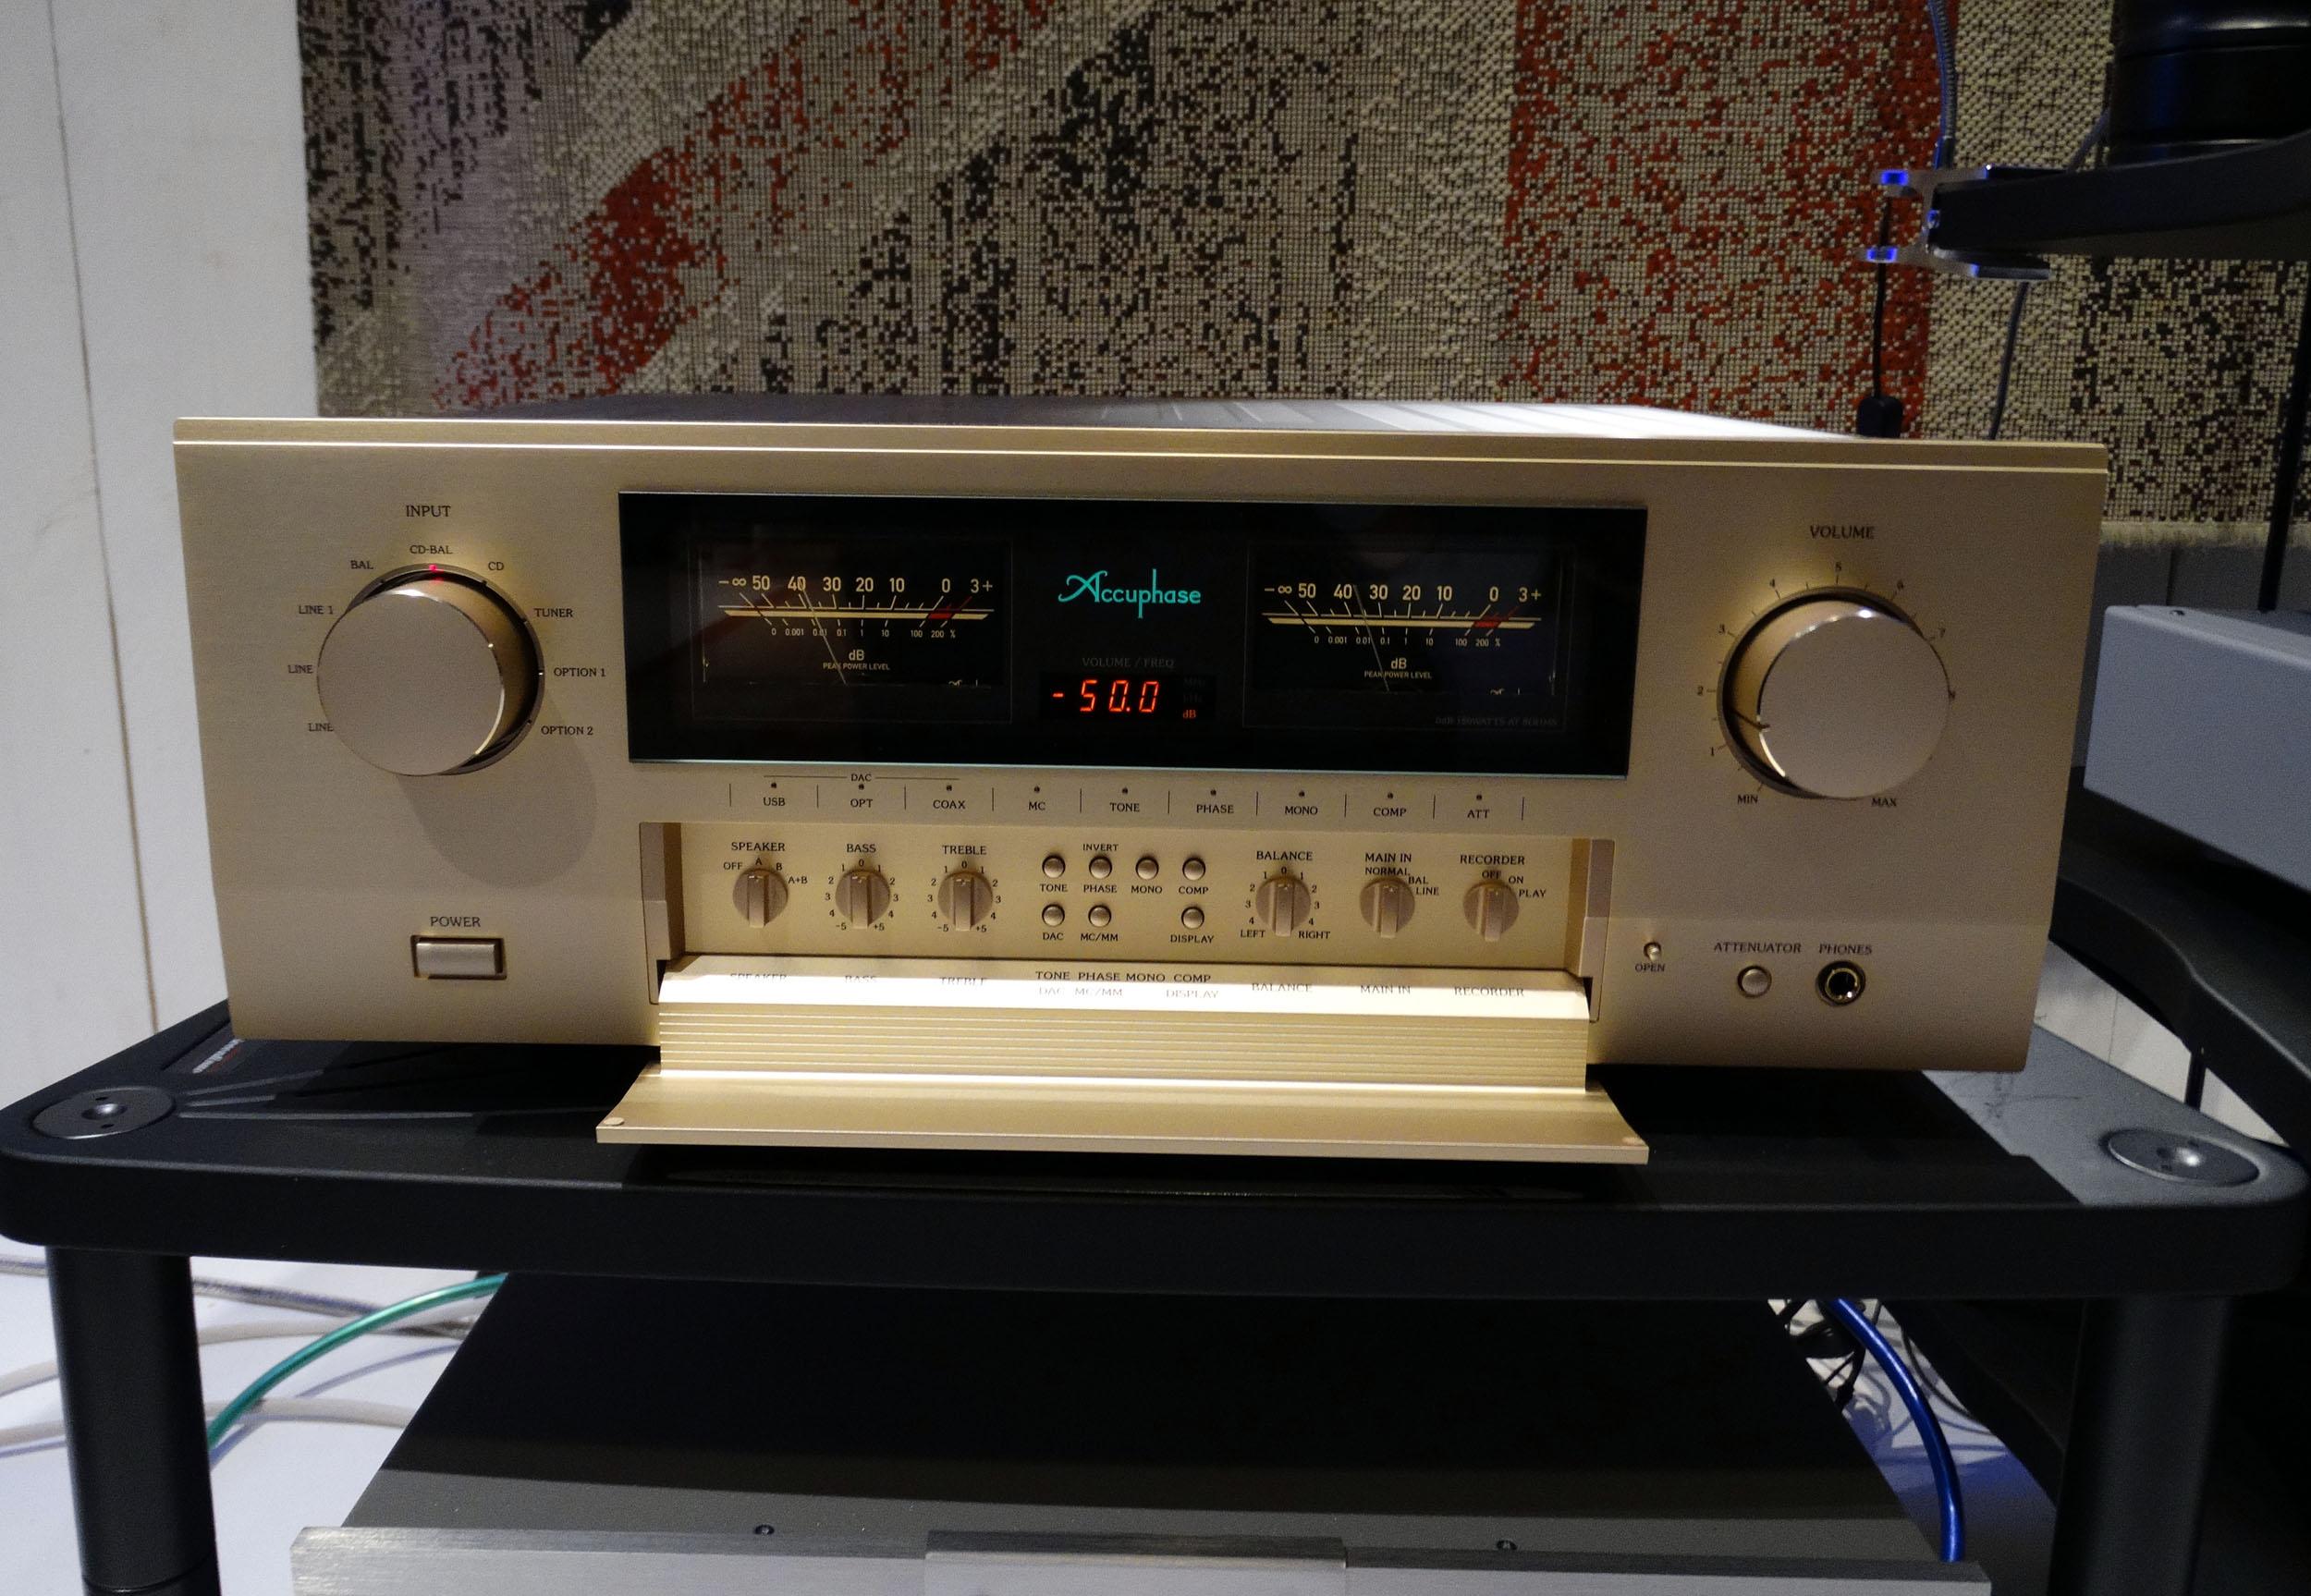 Accuphase E 480 Hans Audio 3 Nieuw binnen: Accuphase E-480